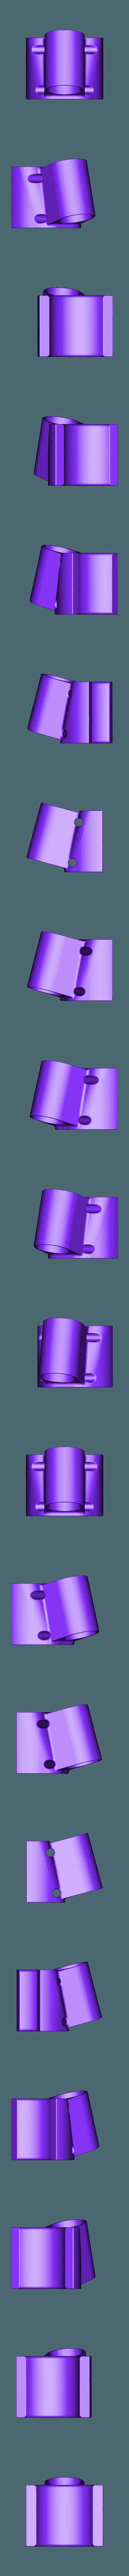 suprabeam_tris.stl Download STL file Suprabeam M6xr lightbeam bike mount • 3D printer object, touchthebitum